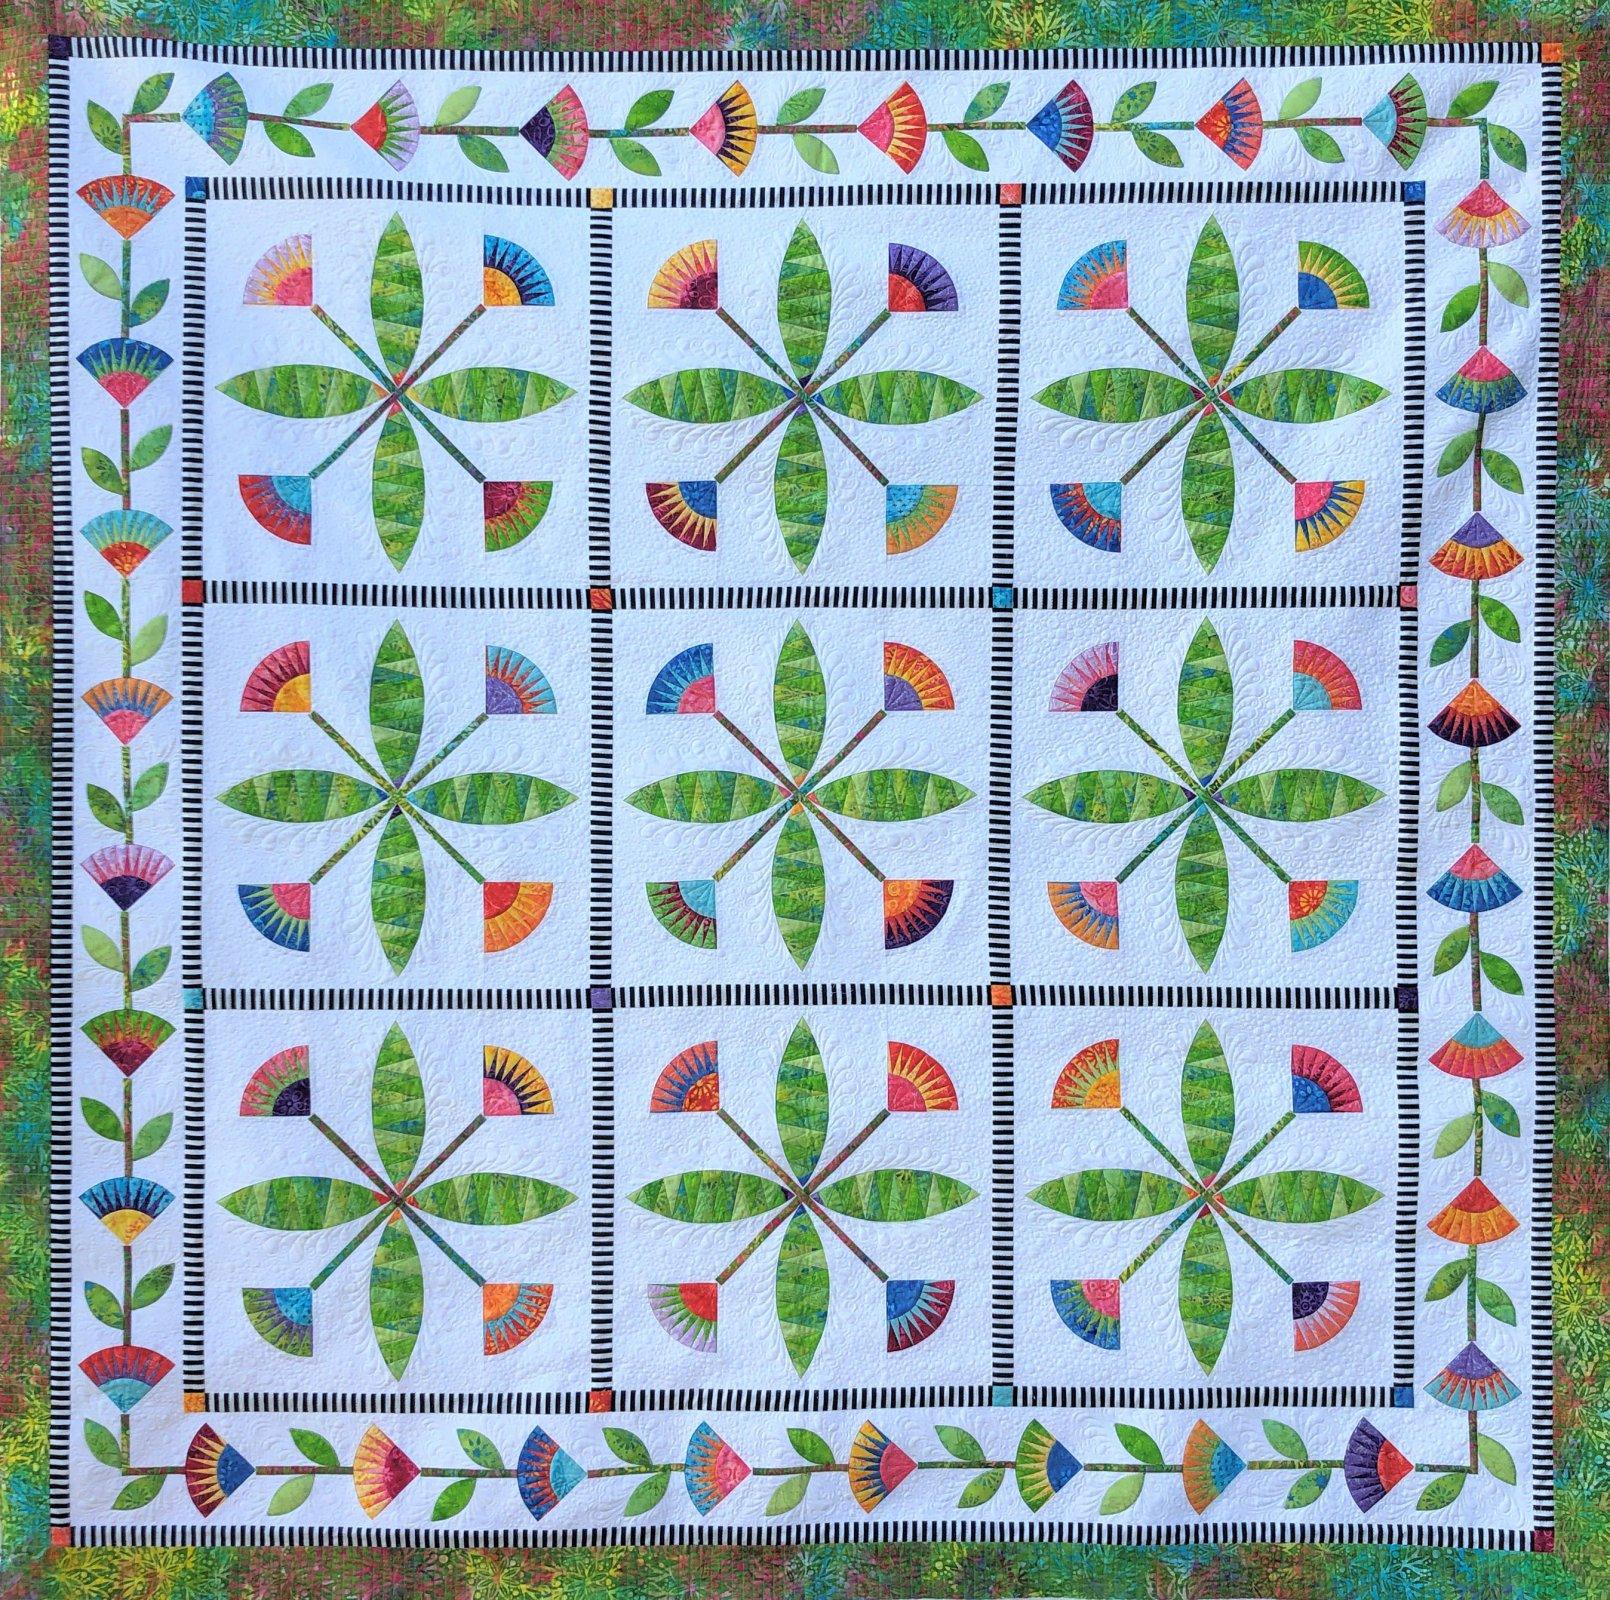 Summertime fabric quilt kit by Jacqueline de Jonge, BeColourful for Anthology Fabrics 52581QK